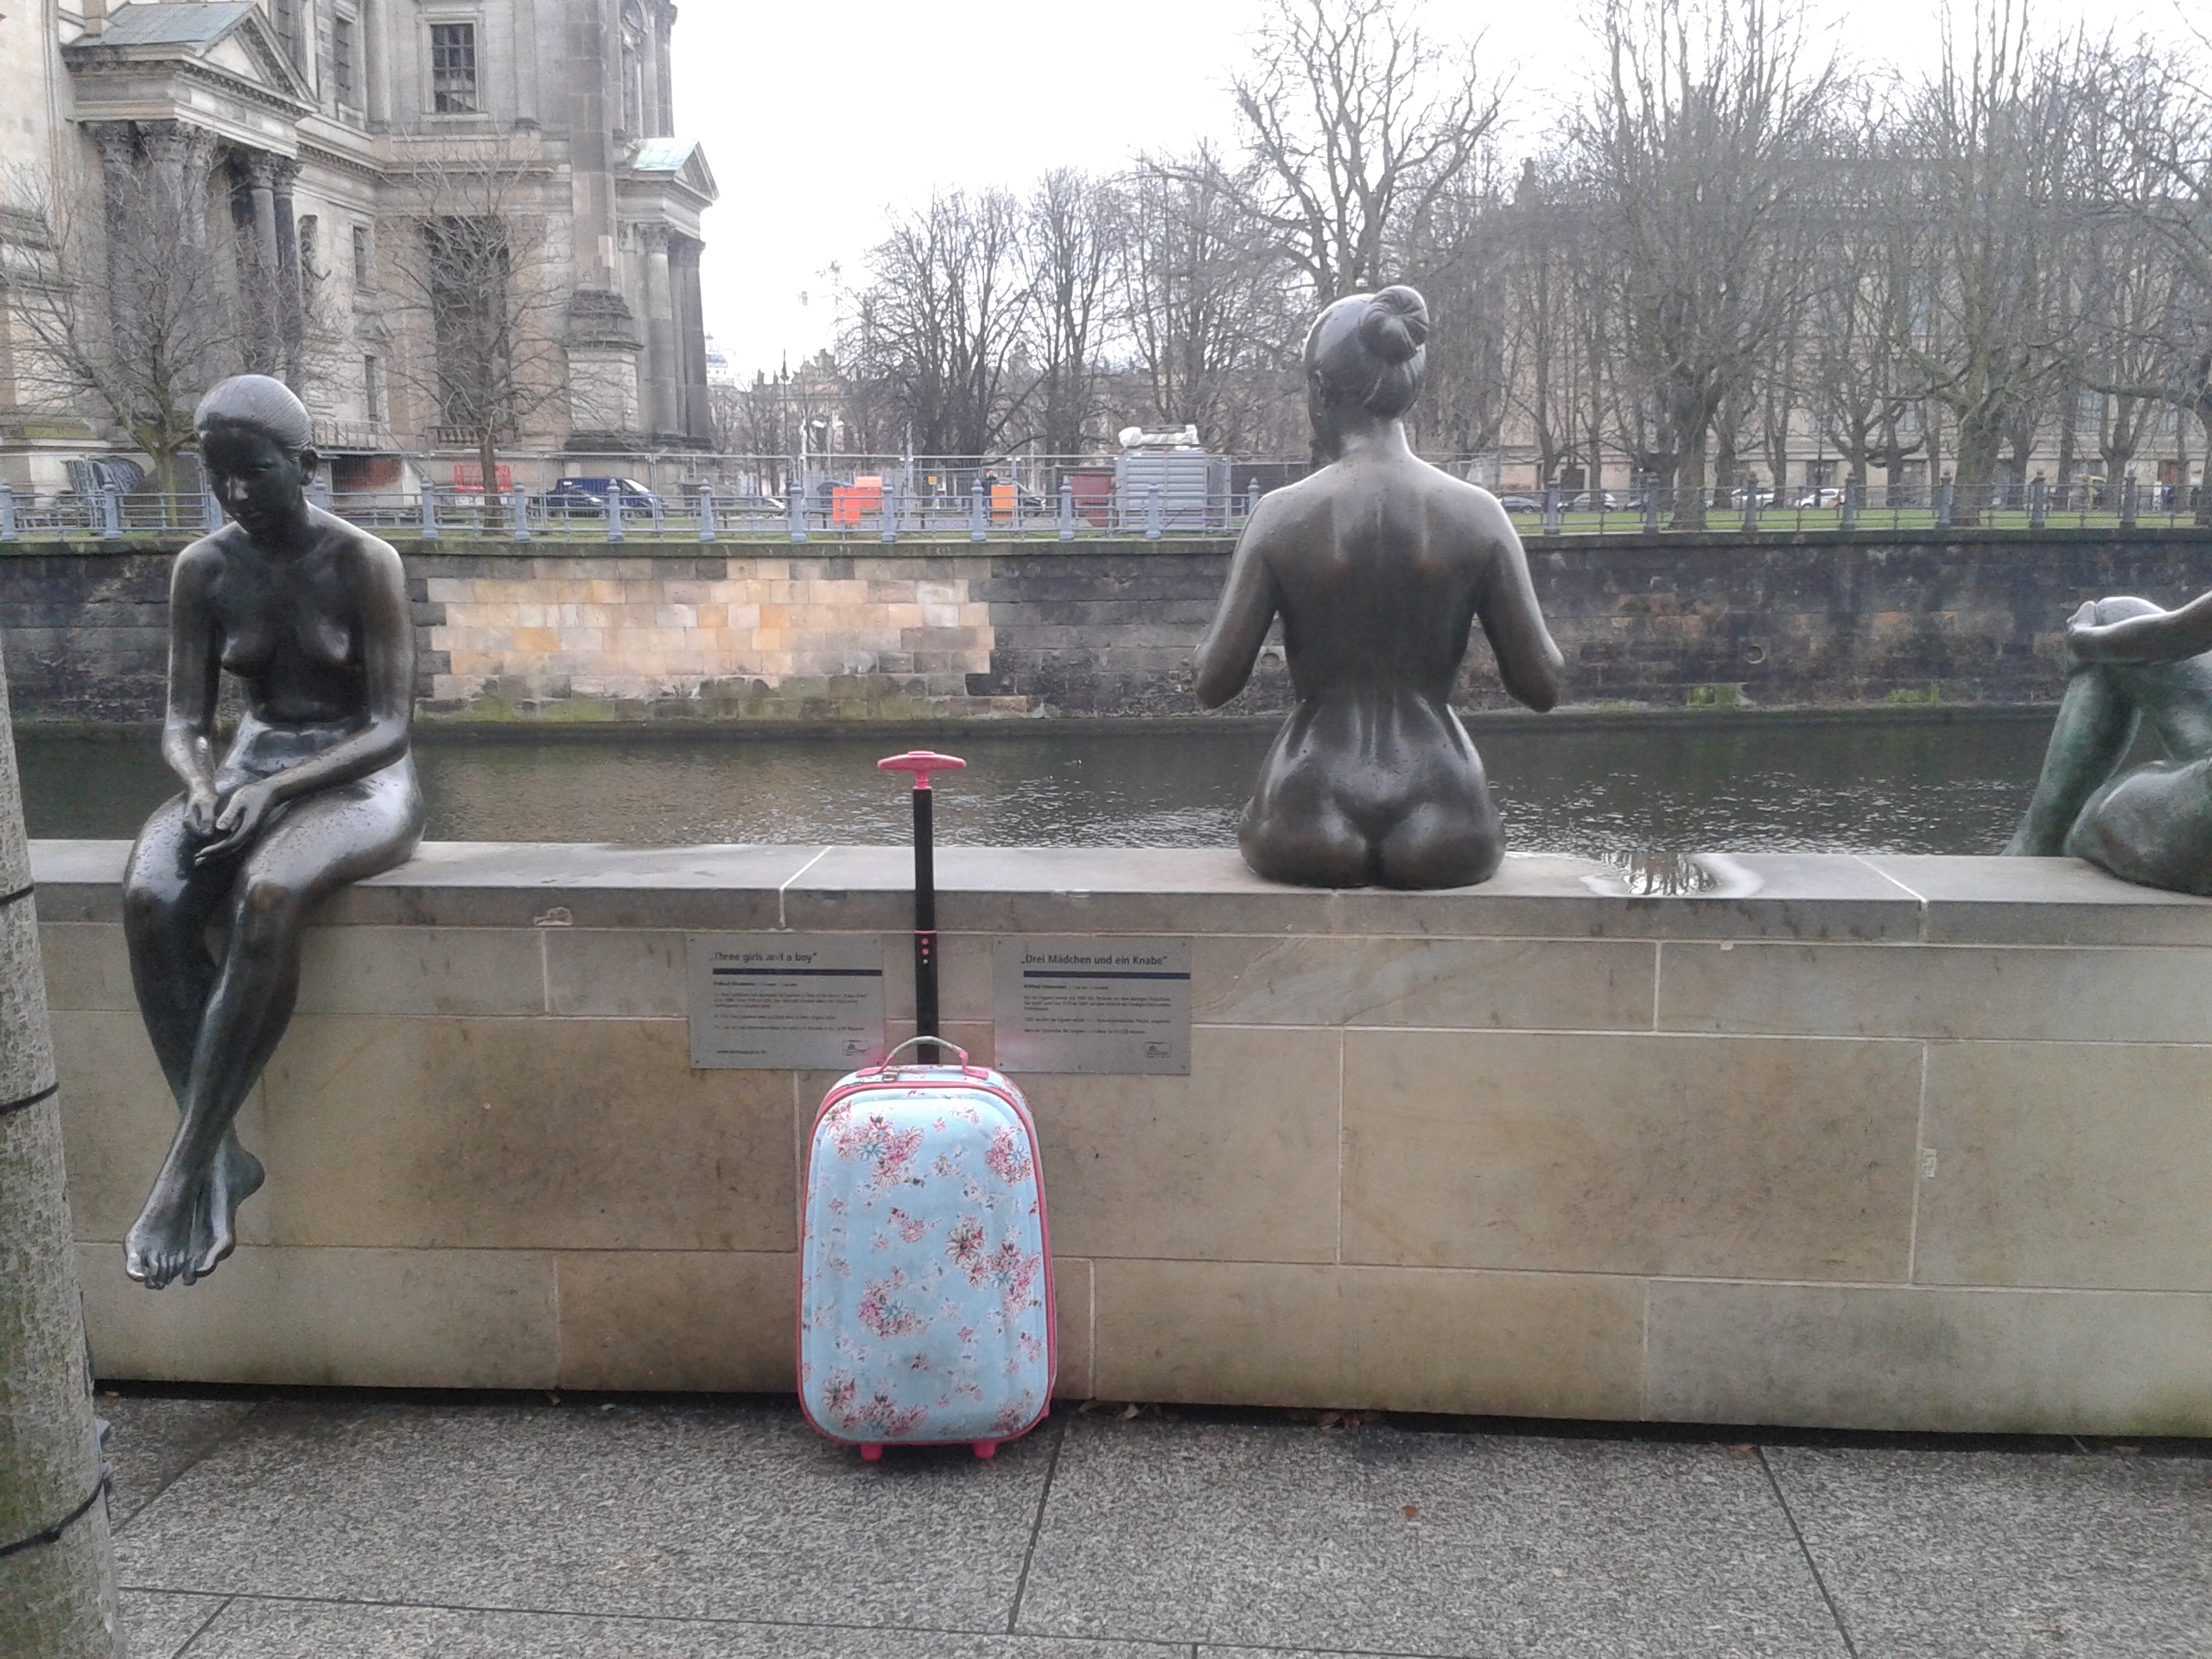 berlin suitcase colourful sculptures